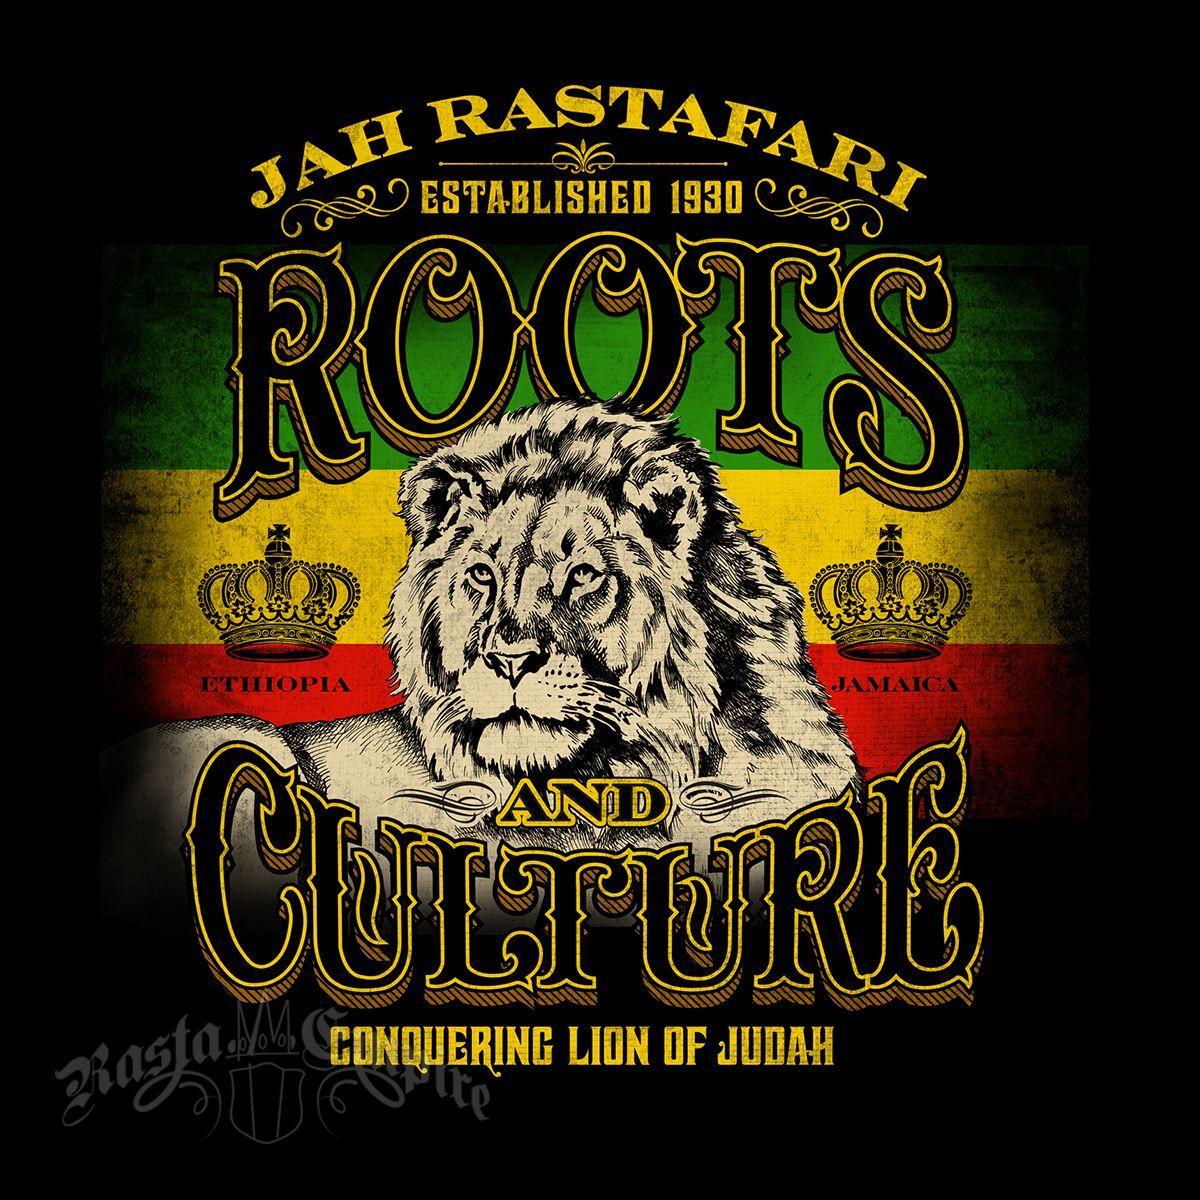 LION OF JUDDAH SKULL CROWN MARIJUANA WEED RASTA RASTAFARIAN T-SHIRT